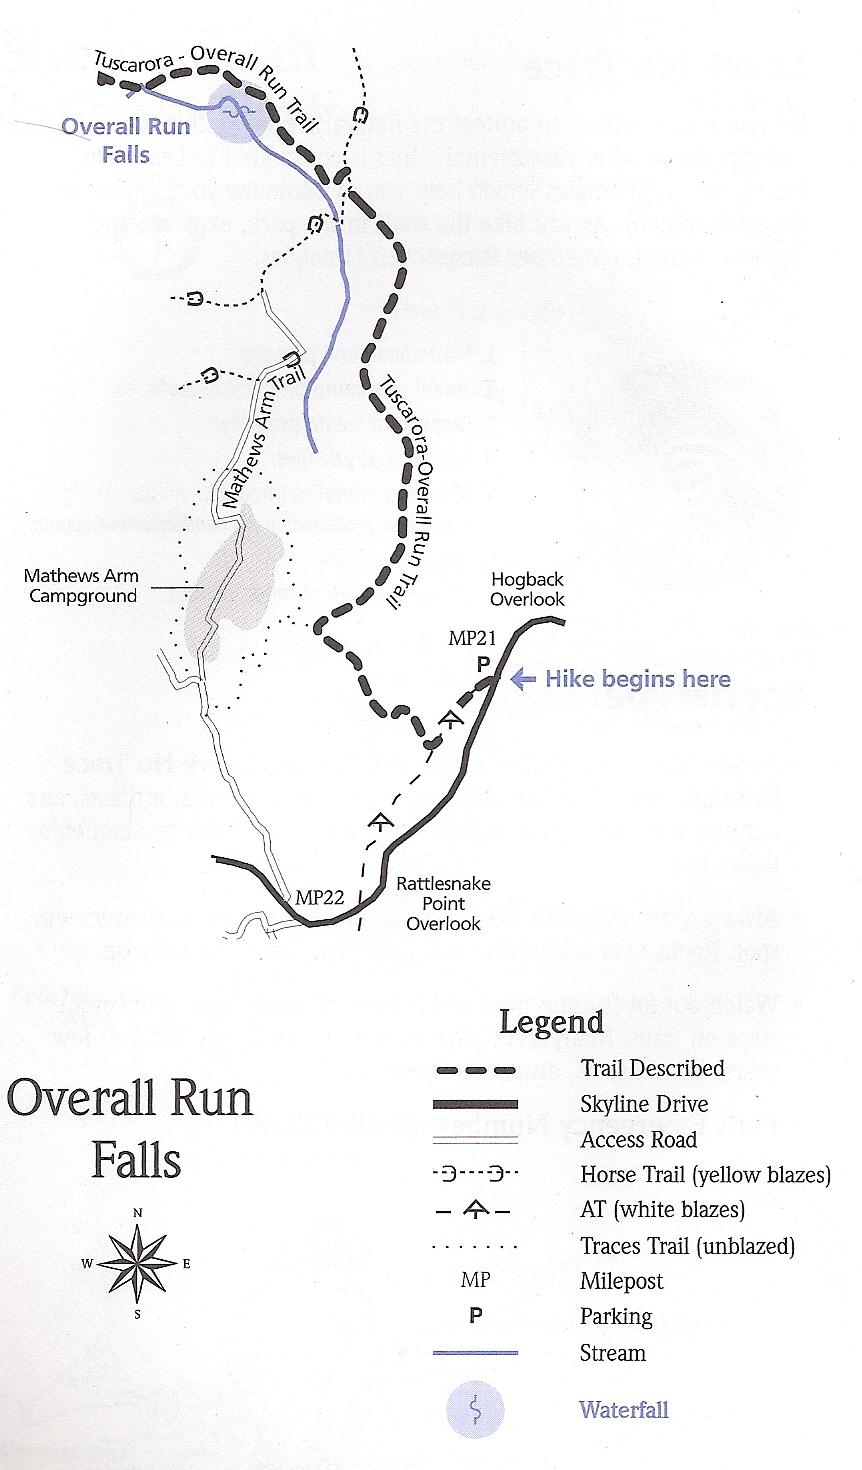 Overall Run Falls